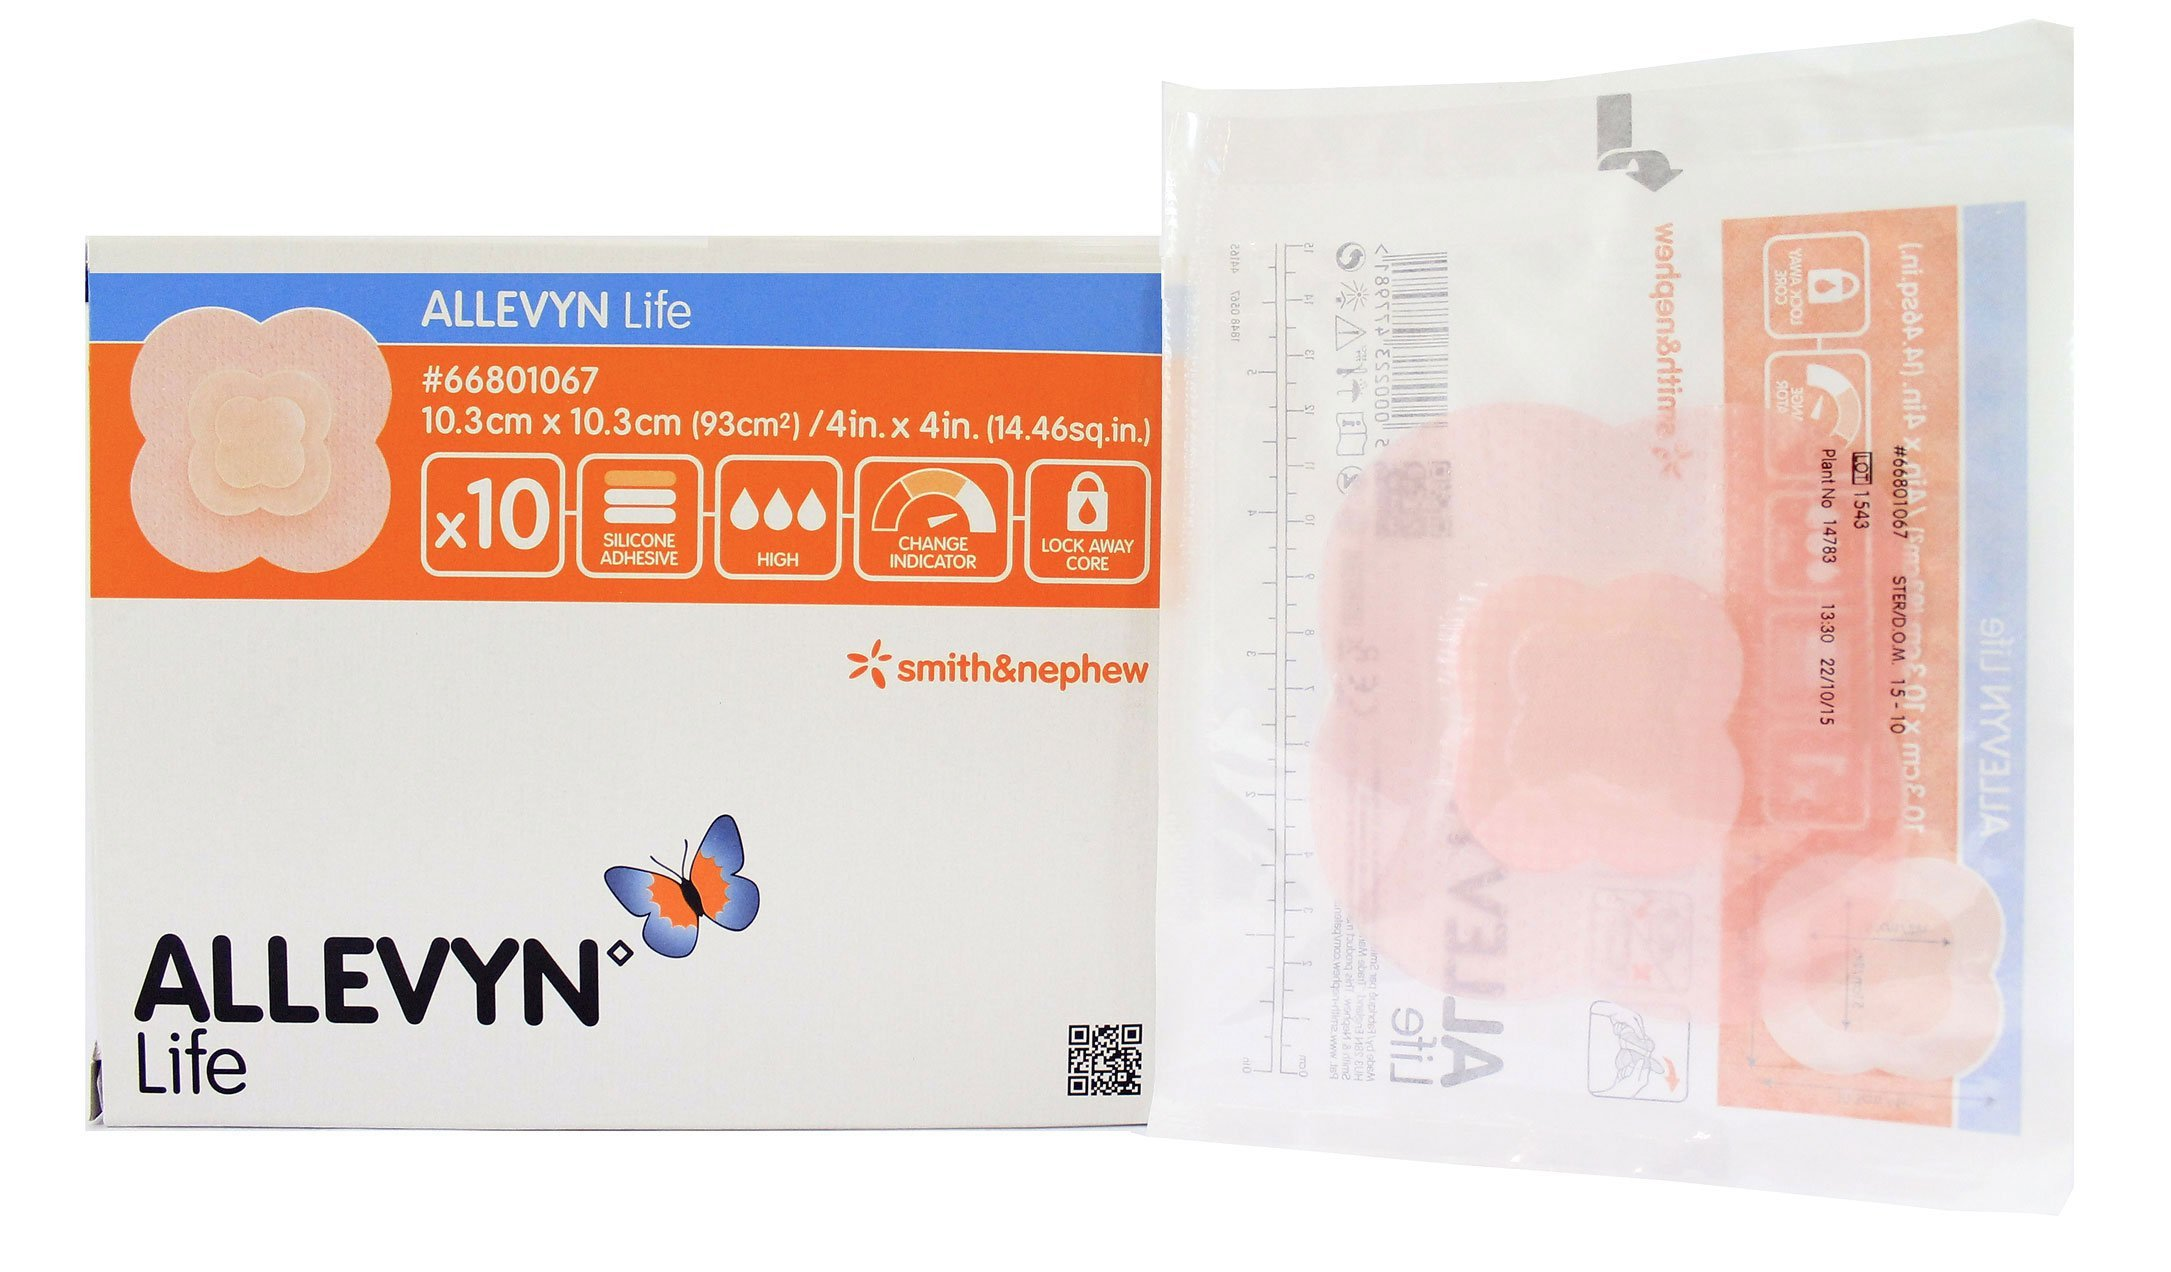 Smith & Nephew Foam Dressing Allevyn Life 4 X 4'' Quadrilobe Sterile (#66801067, Sold Per Box)